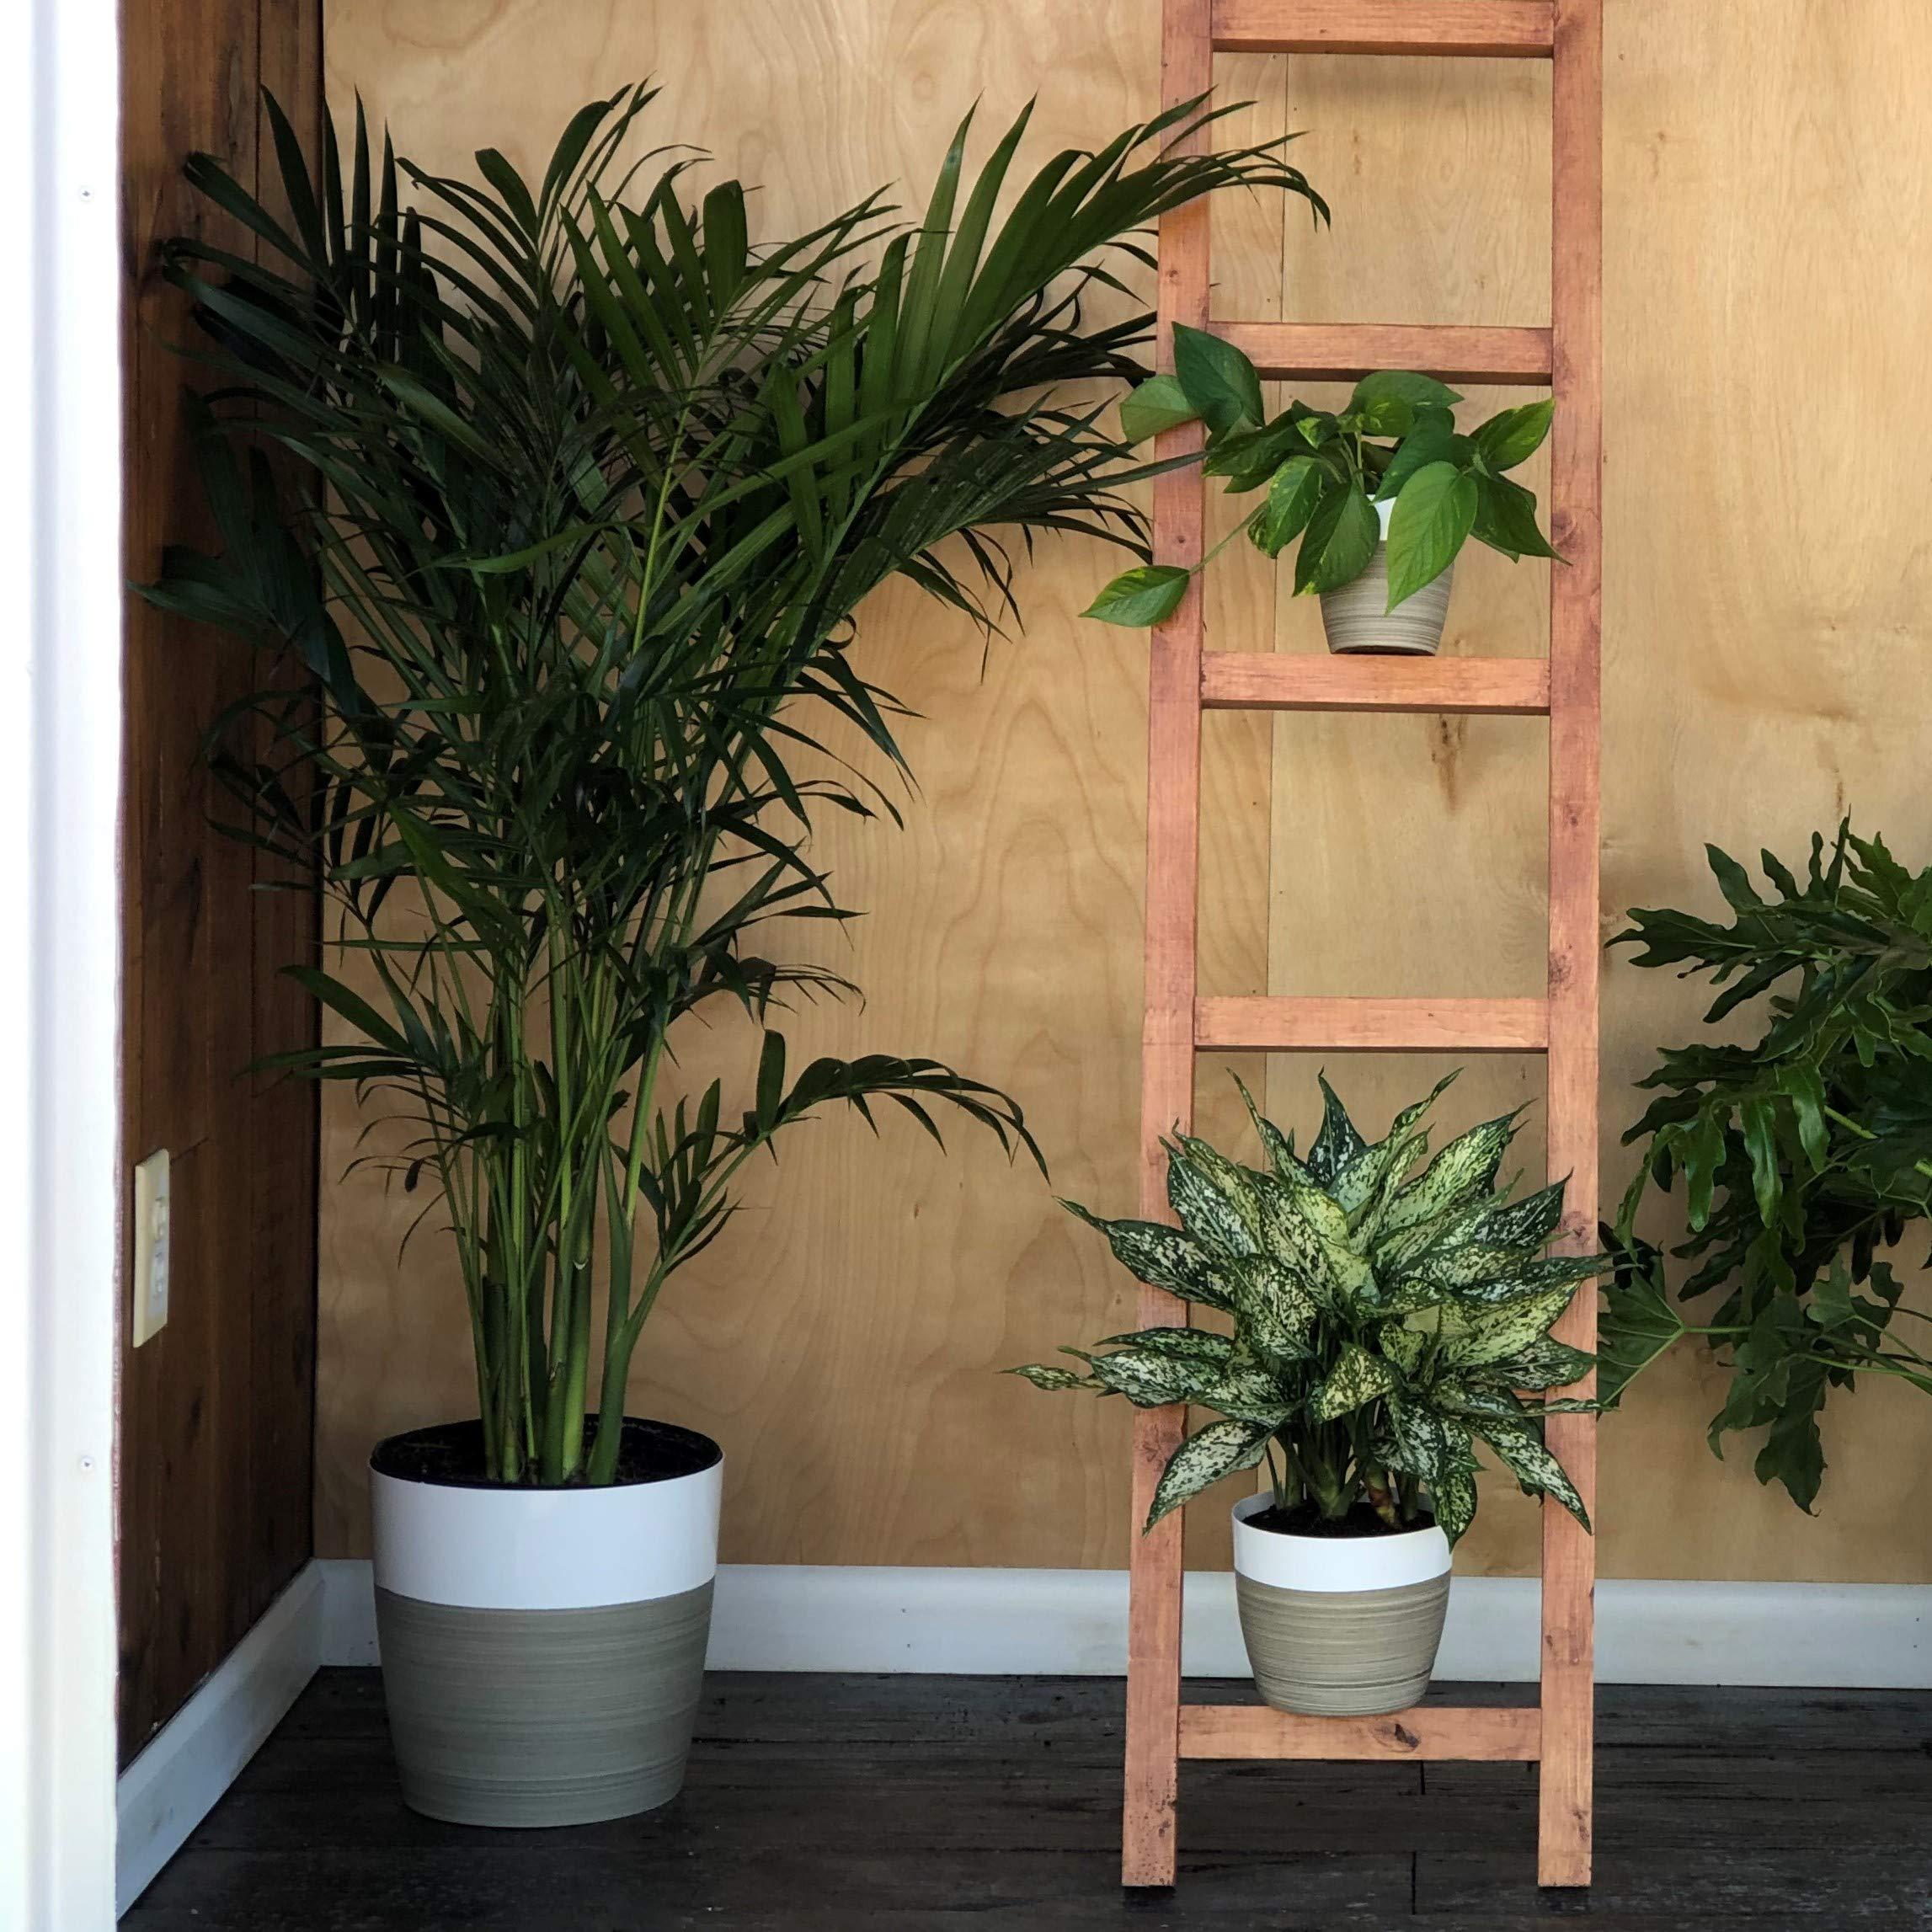 Costa Farms Live Areca Palm in Decor Planter, 3-Foot, White-Natural by Costa Farms (Image #3)